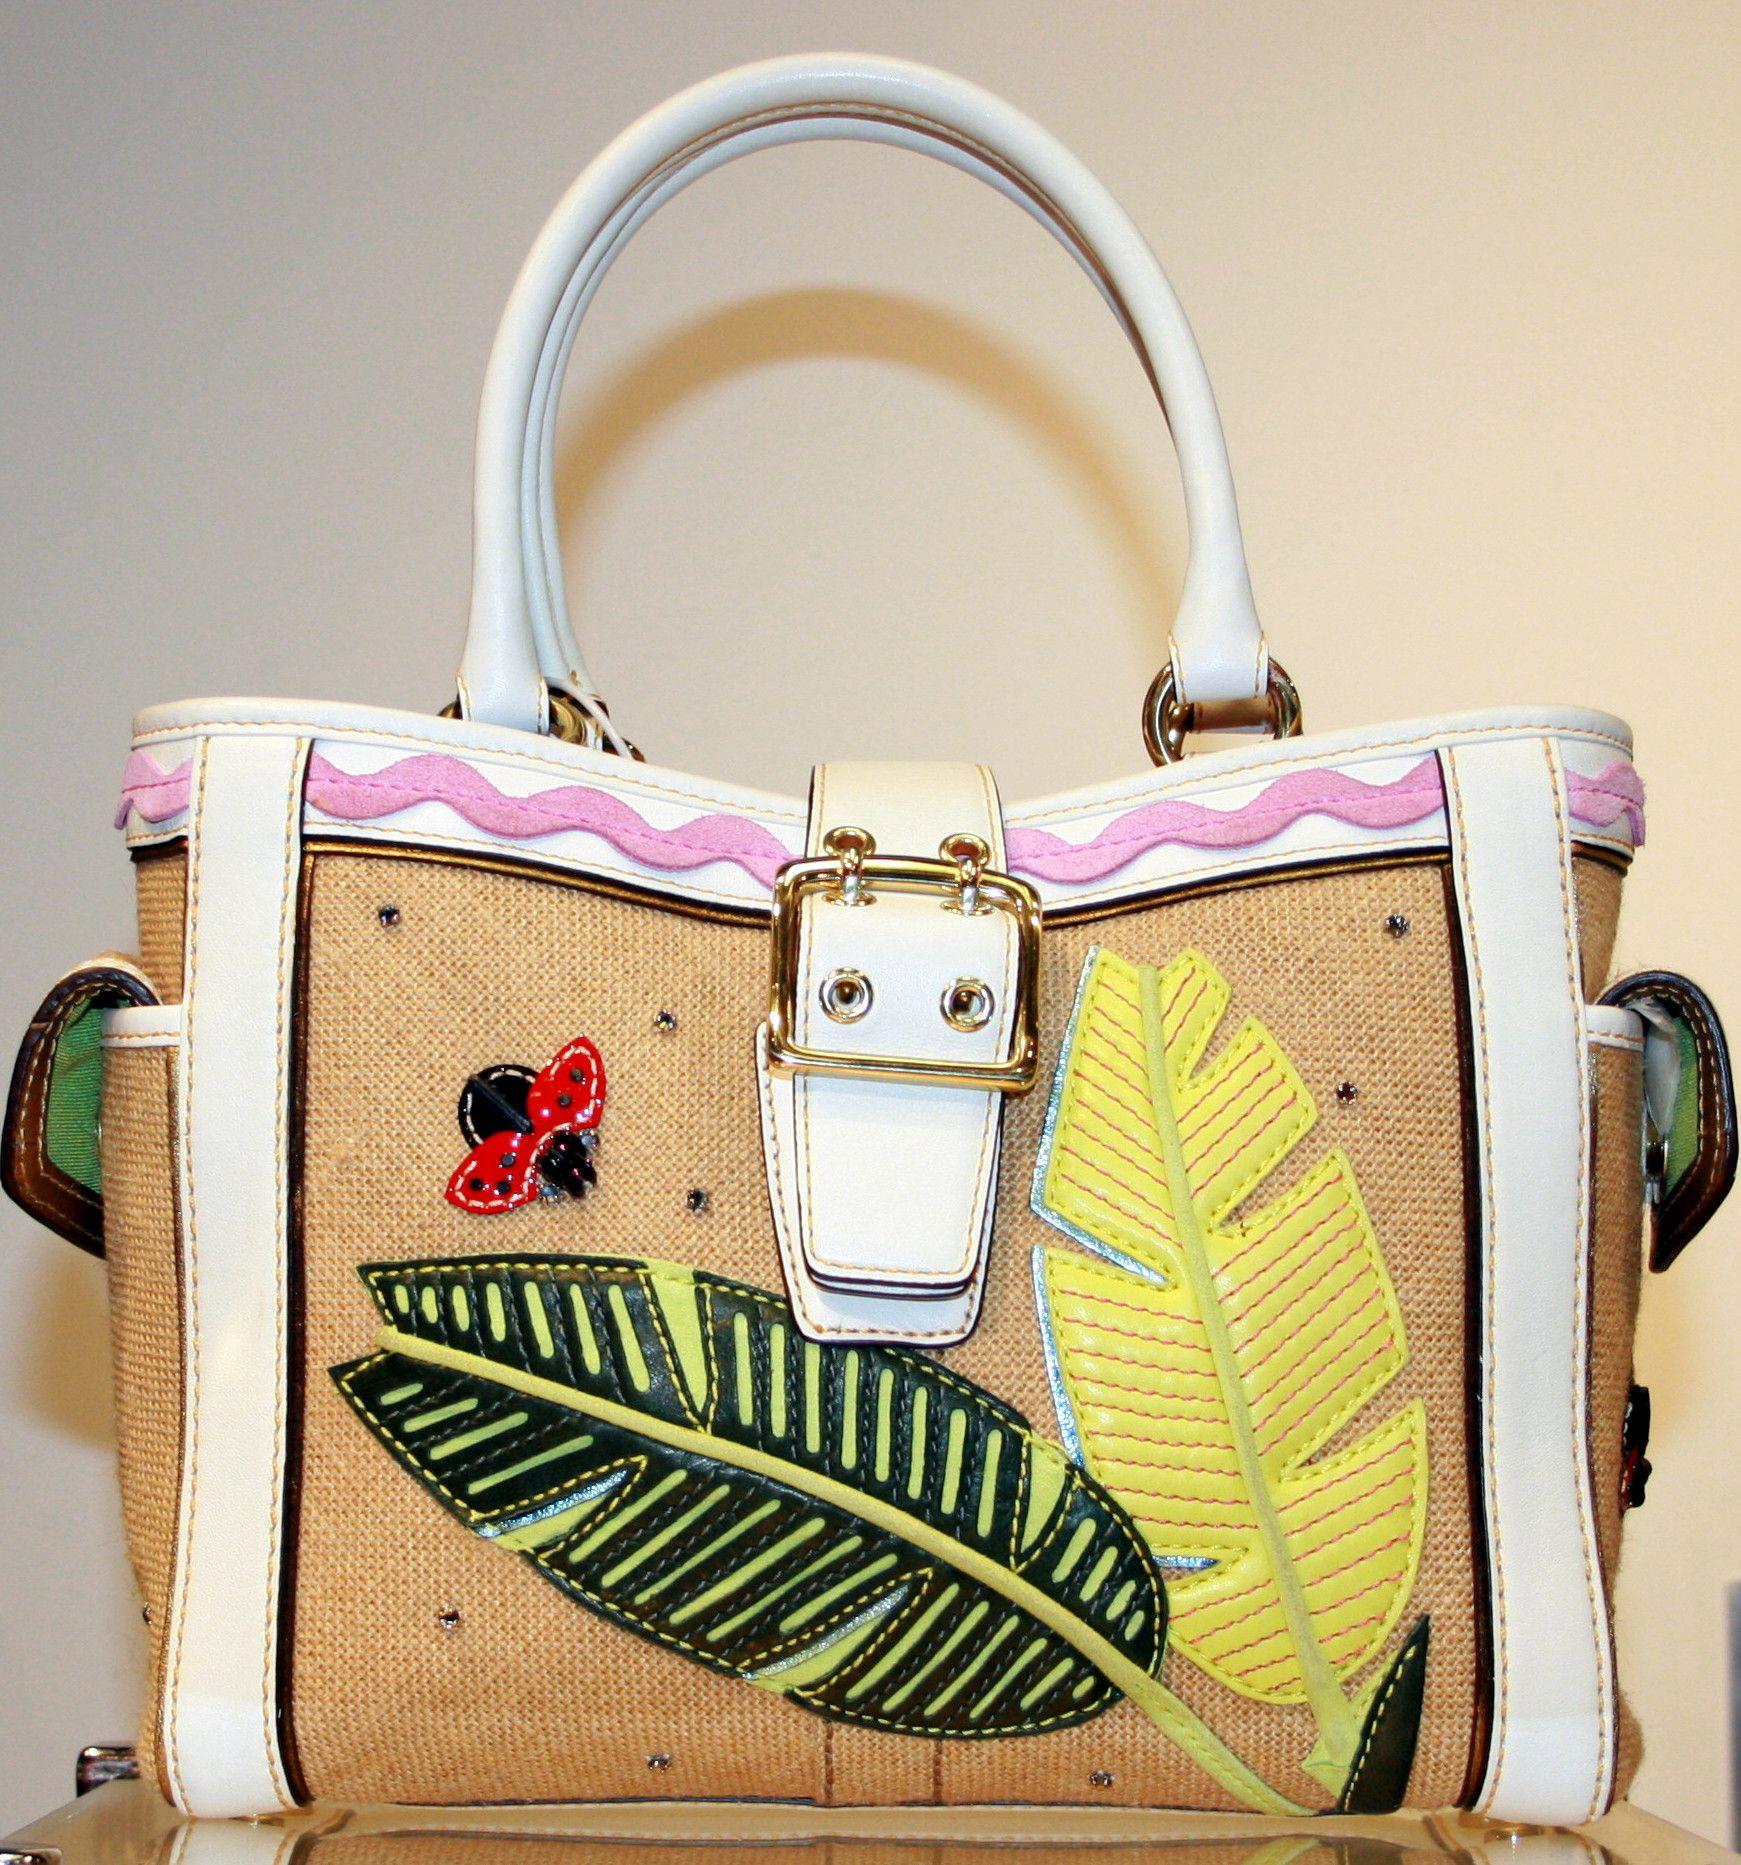 Fun And Fresh Coach Ladybug Handbag 125